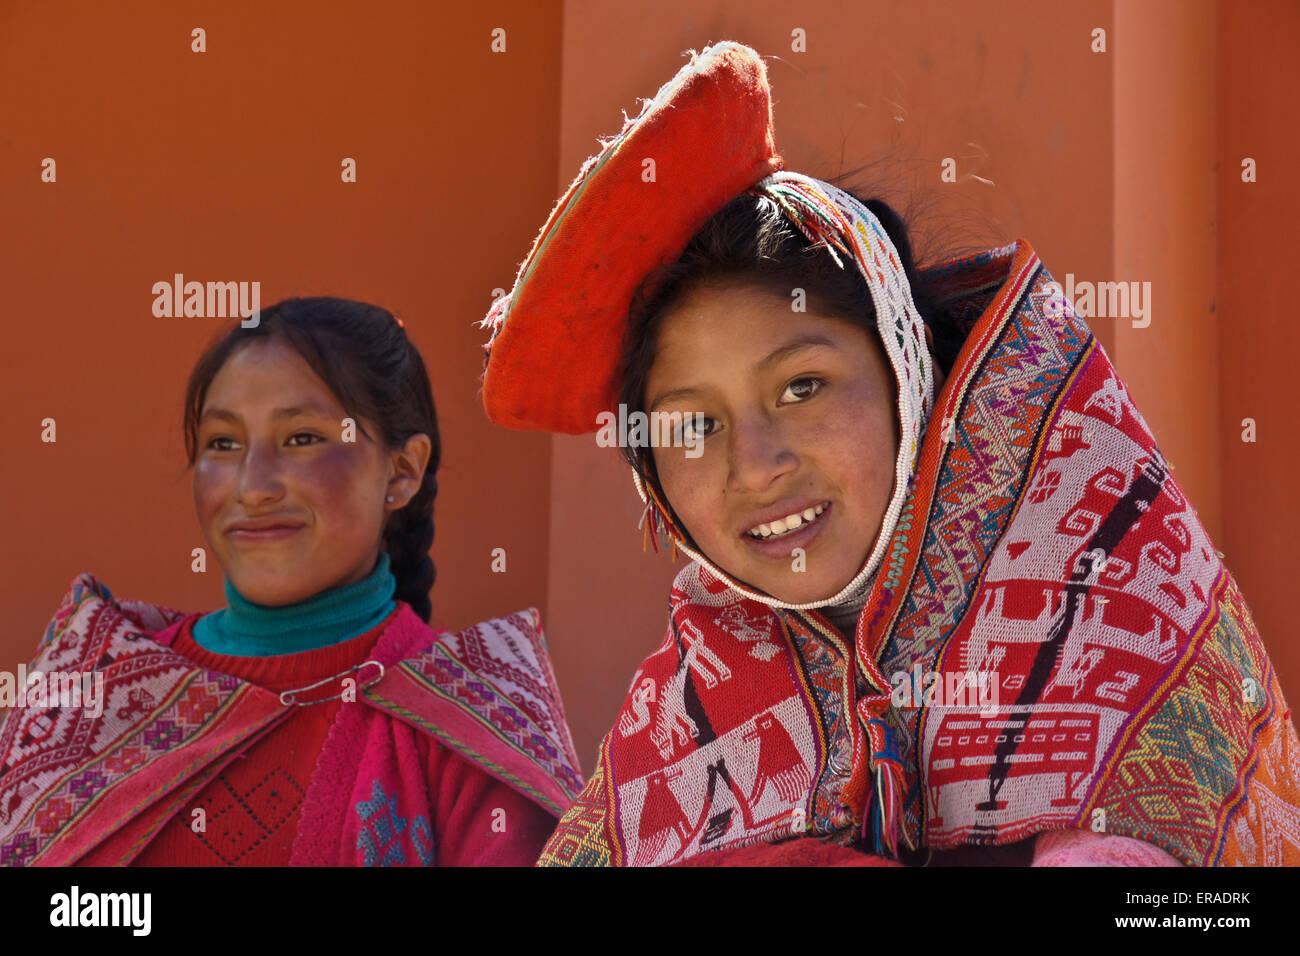 Quechua Indian girls, Willoq, Peru - Stock Image